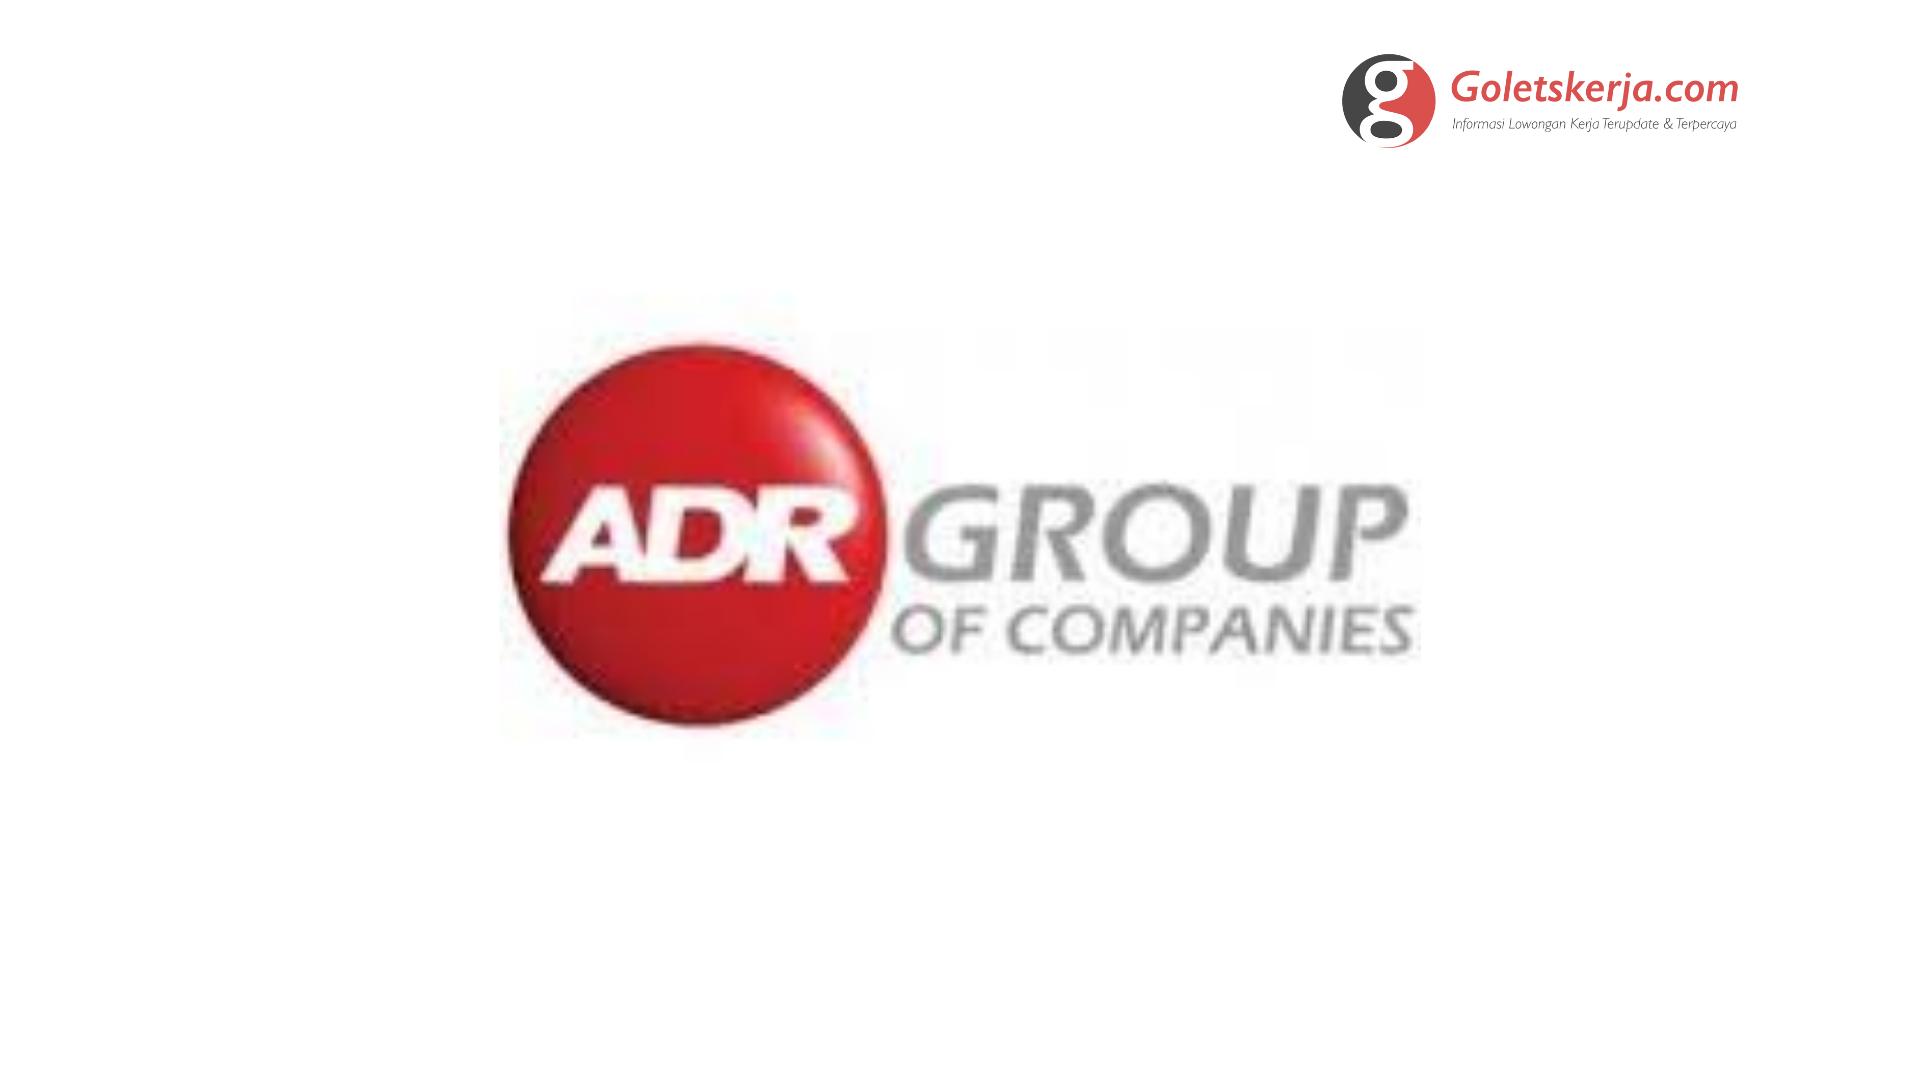 Lowongan Kerja PT Selamat Sempurna Tbk (ADR Group) | Terbaru 2021